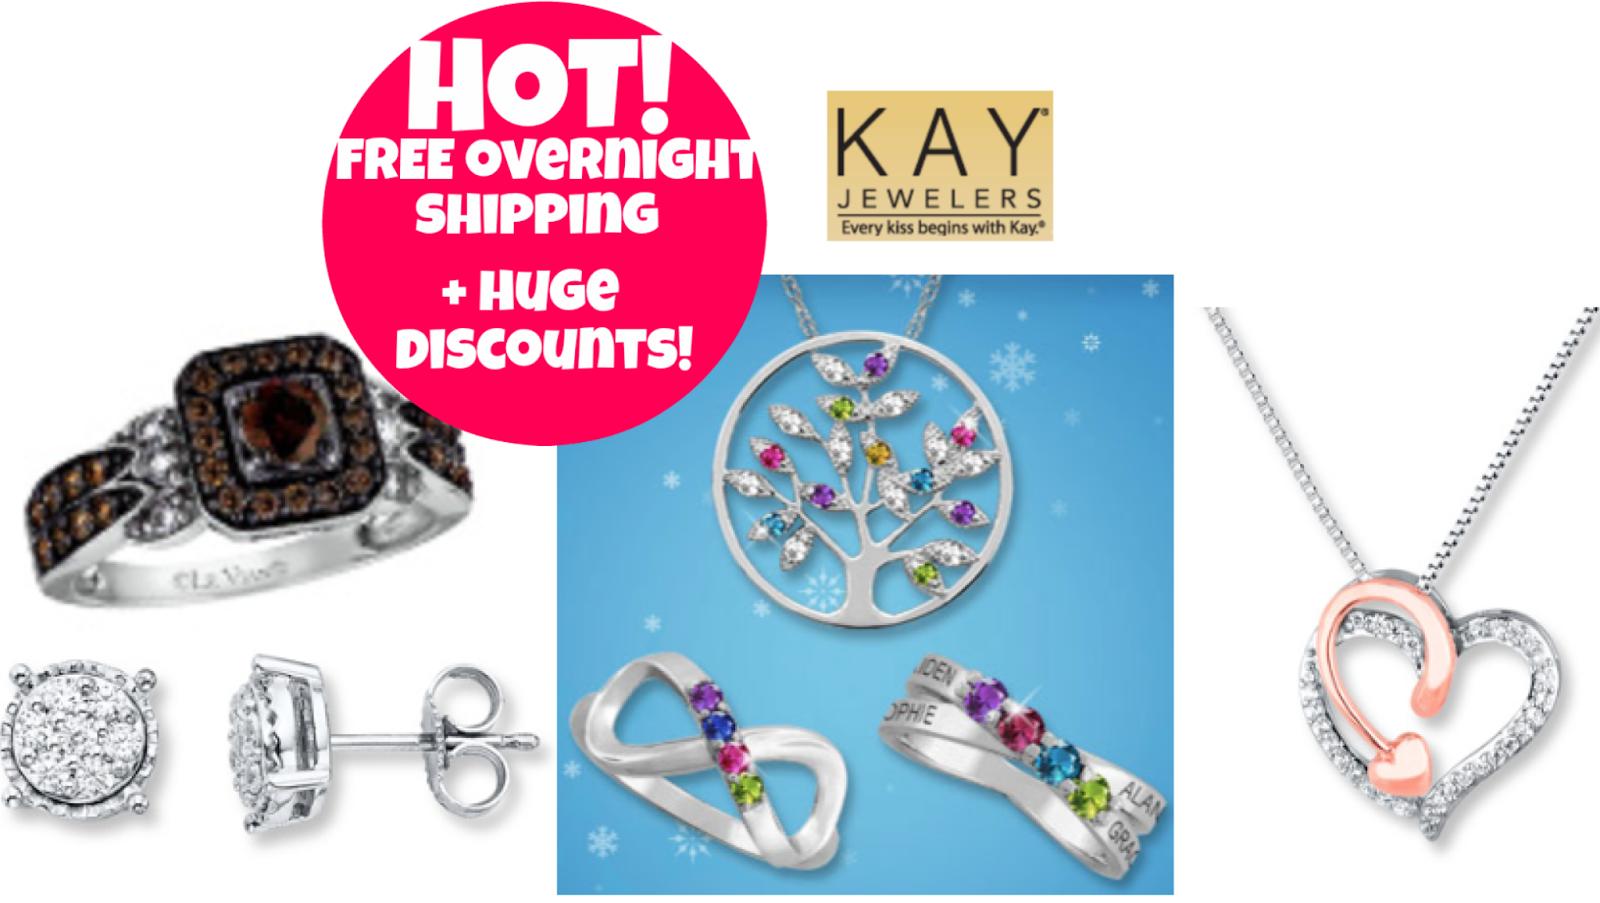 http://www.thebinderladies.com/2014/12/hot-kay-jewelers-free-overnight.html